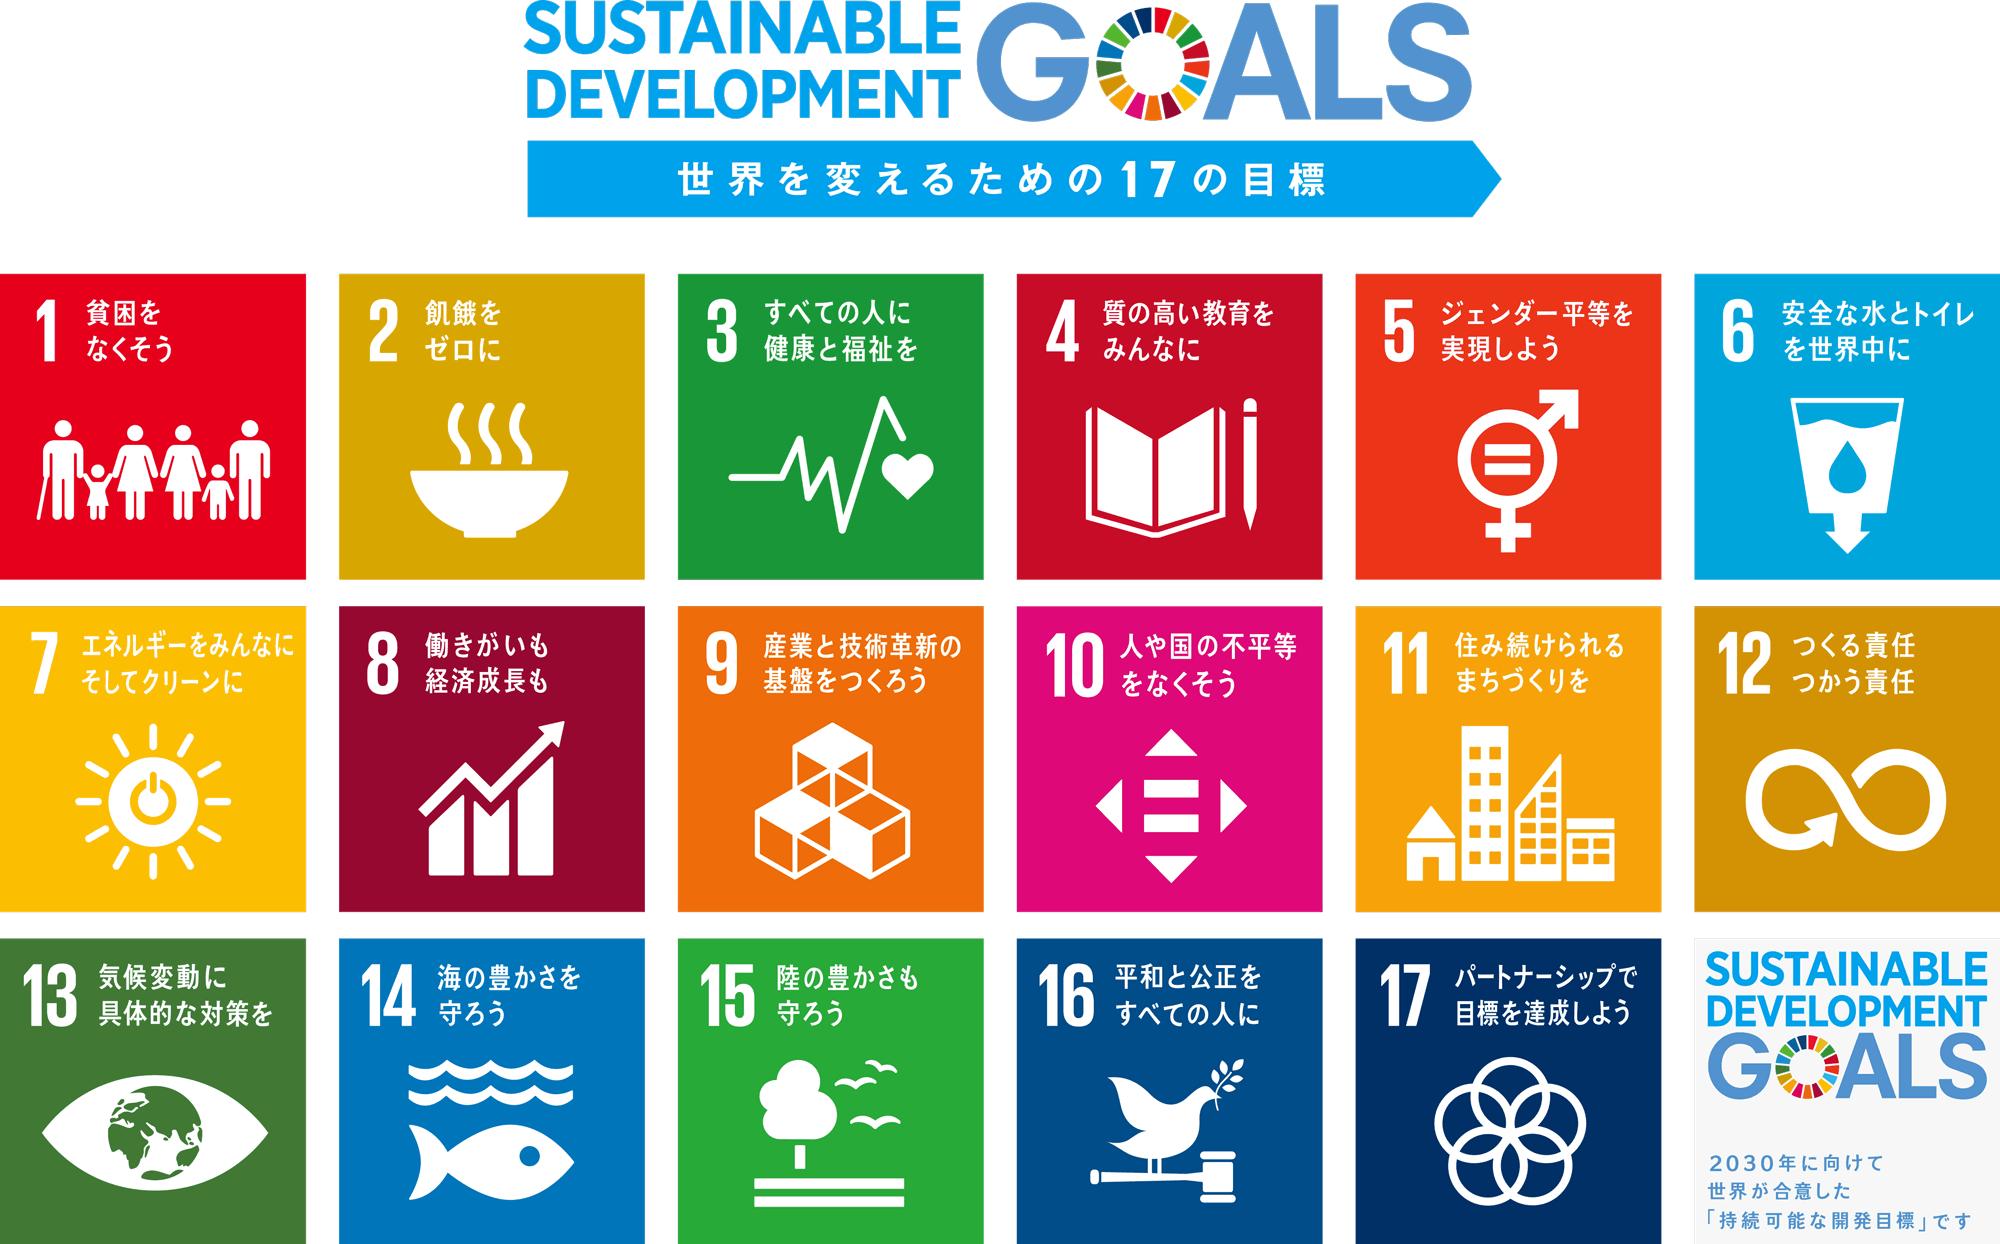 SUSTAINABLE DEVELOPMENT GLOBALS 世界を変えるための17の目標